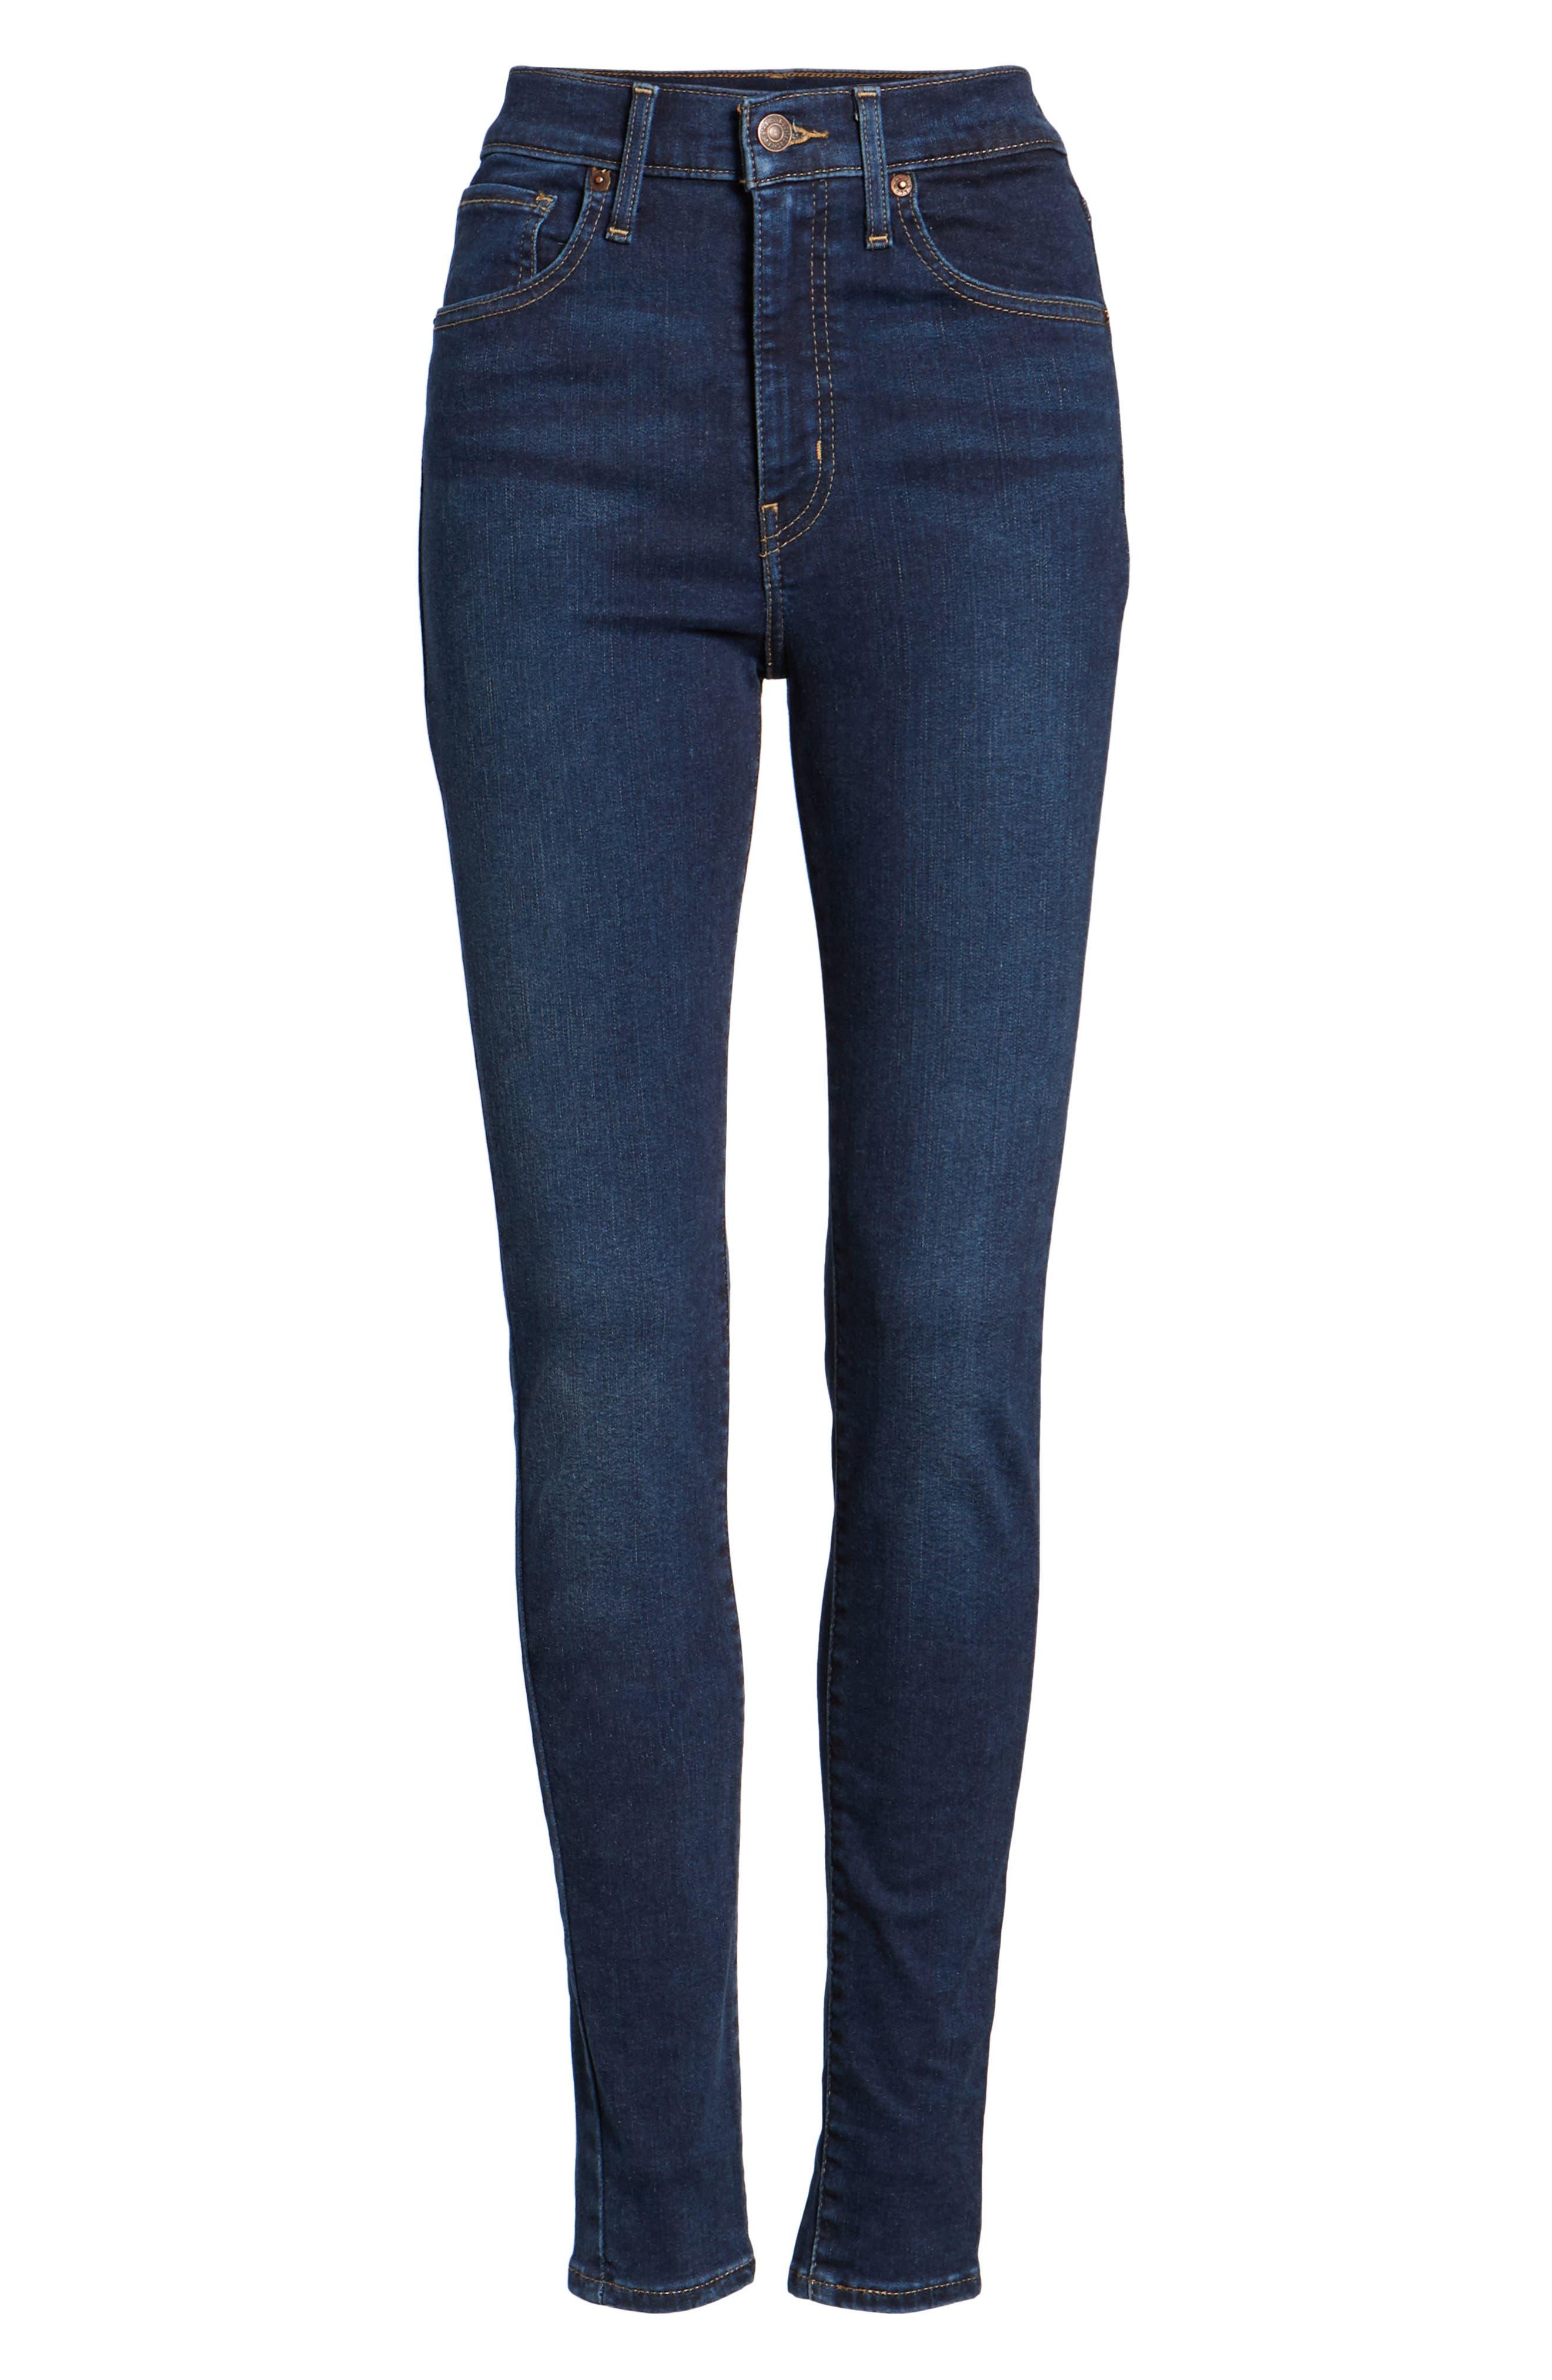 LEVI'S<SUP>®</SUP>, Mile High Super Skinny Jeans, Alternate thumbnail 7, color, JET SETTER